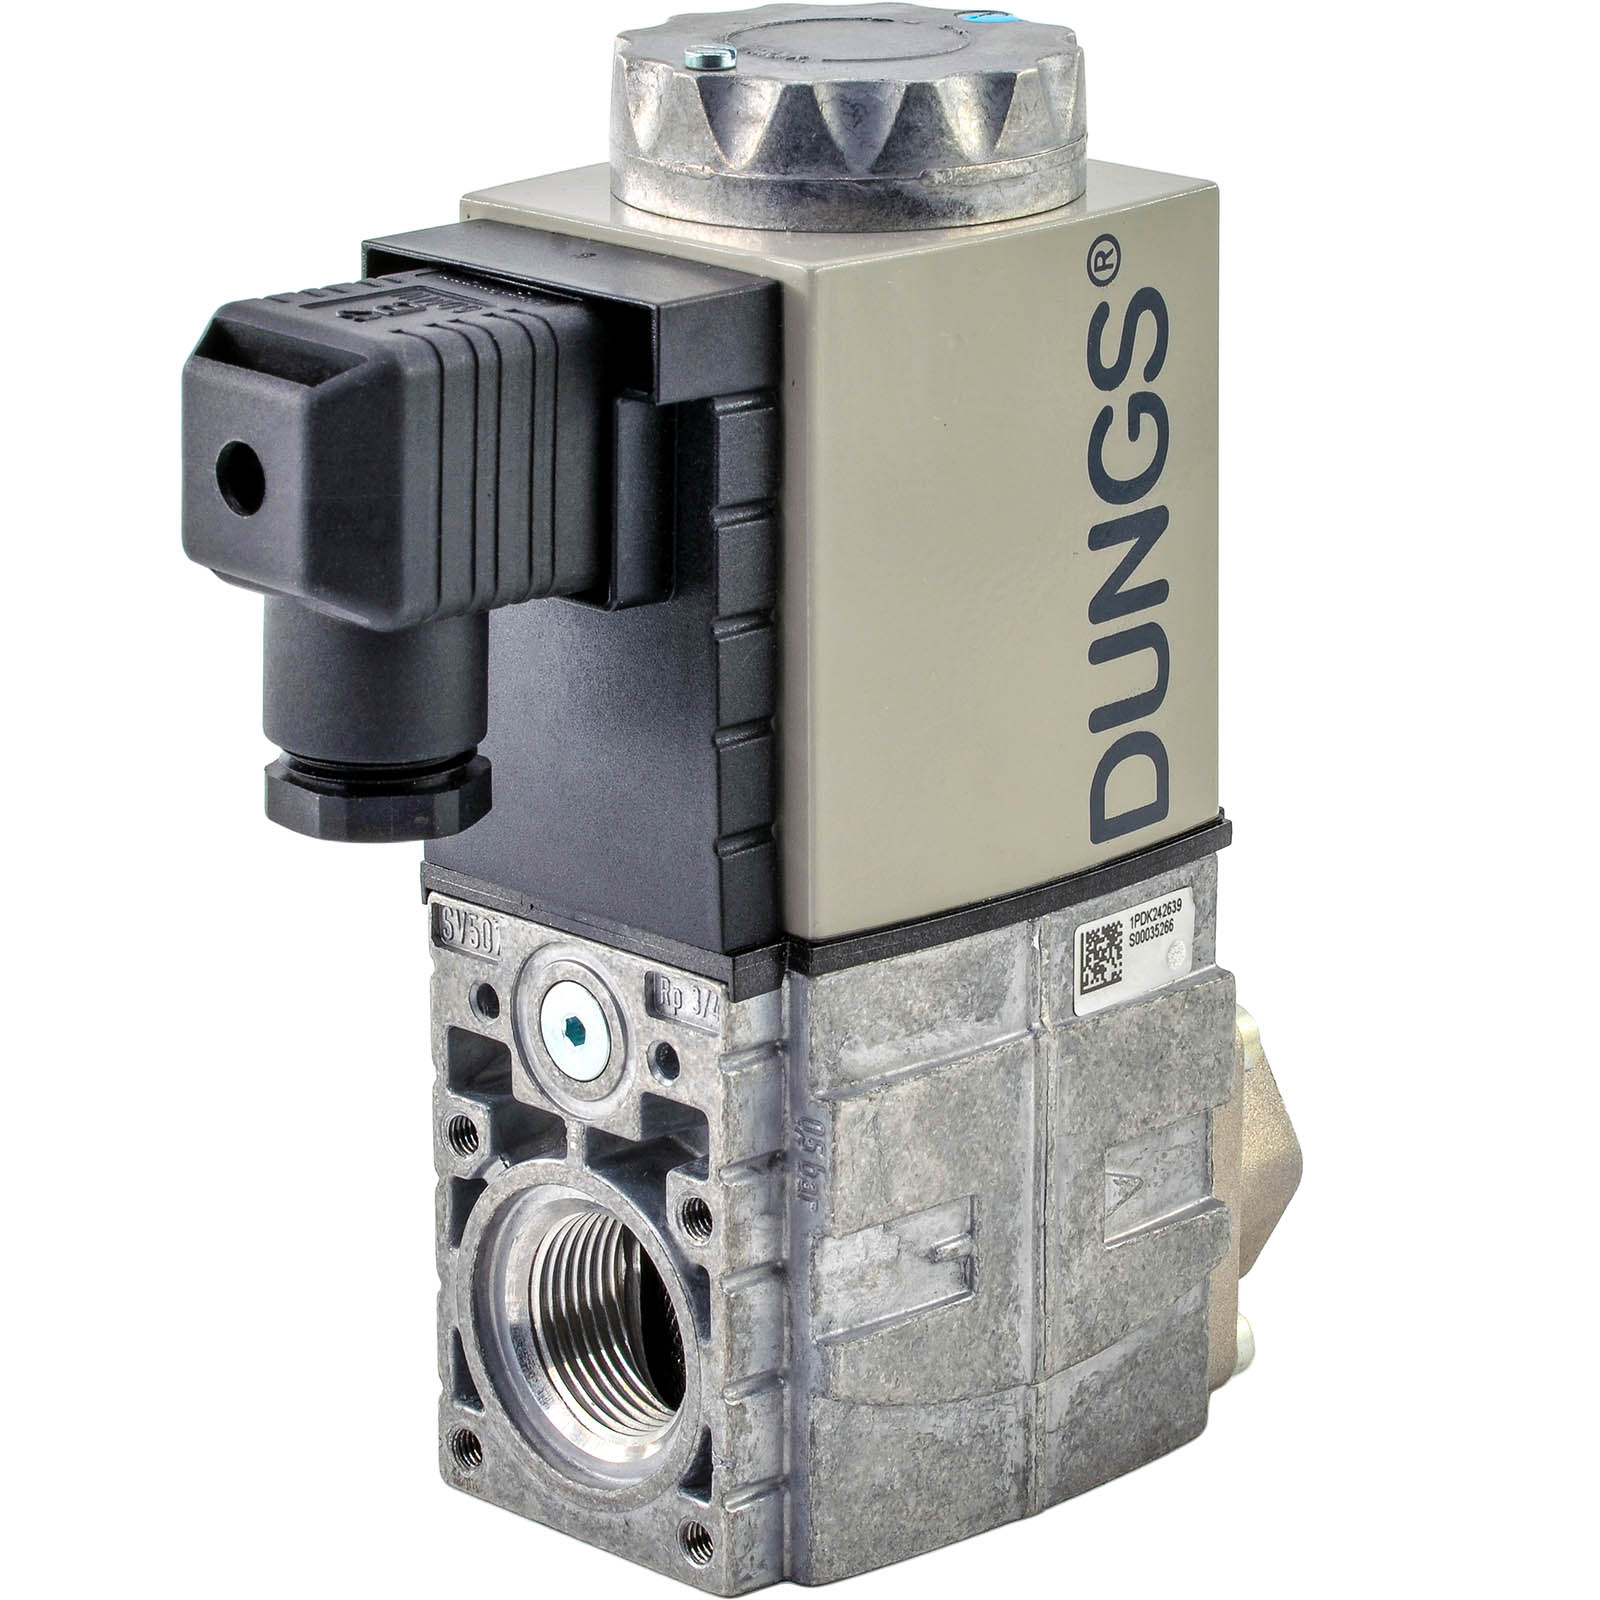 Электромагнитный клапан SV 520 DUNGS цена, купить